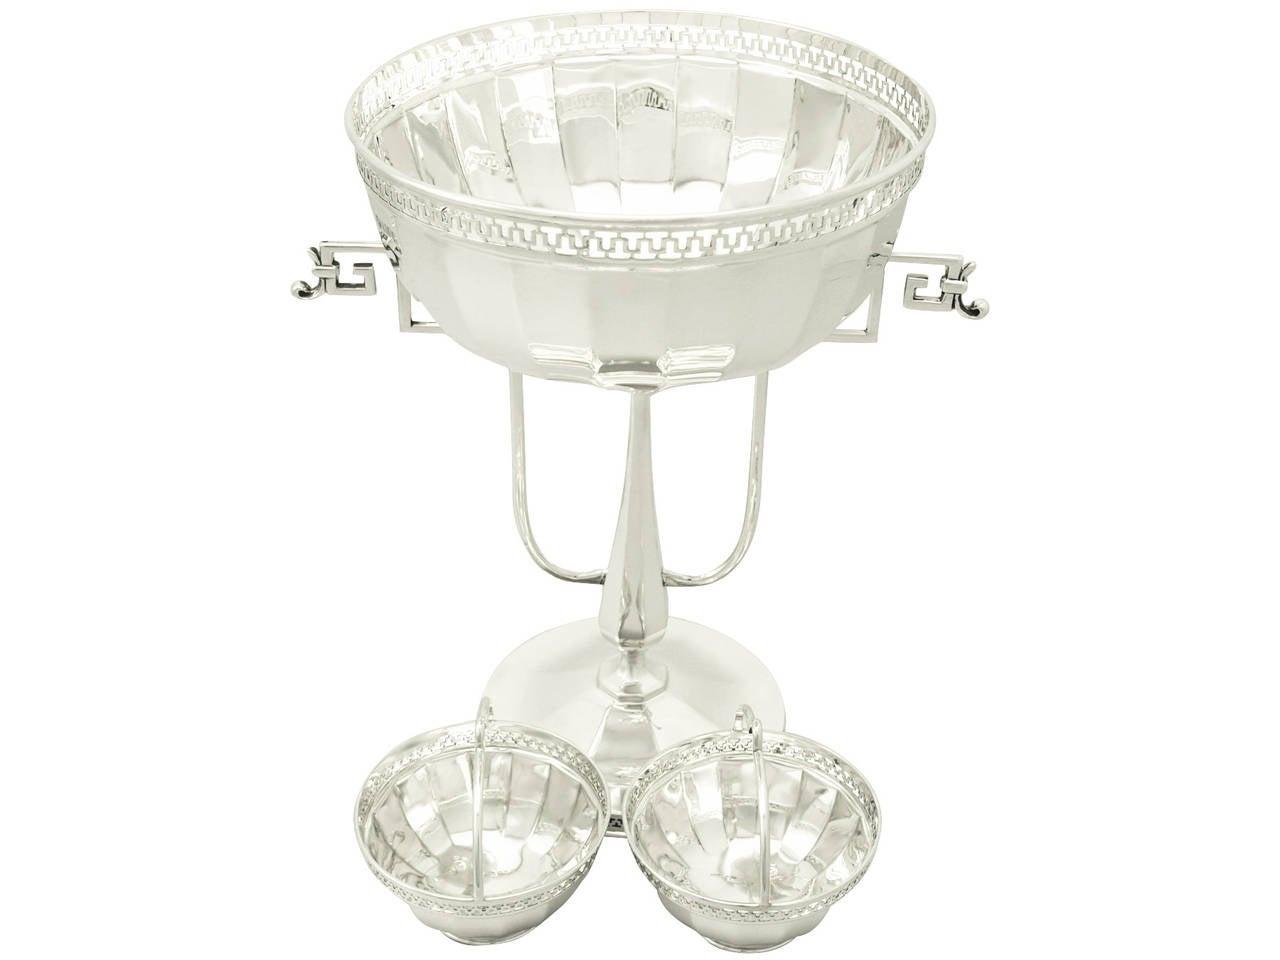 Sterling silver centerpiece antique george v for sale at for Silver centerpieces for dining table